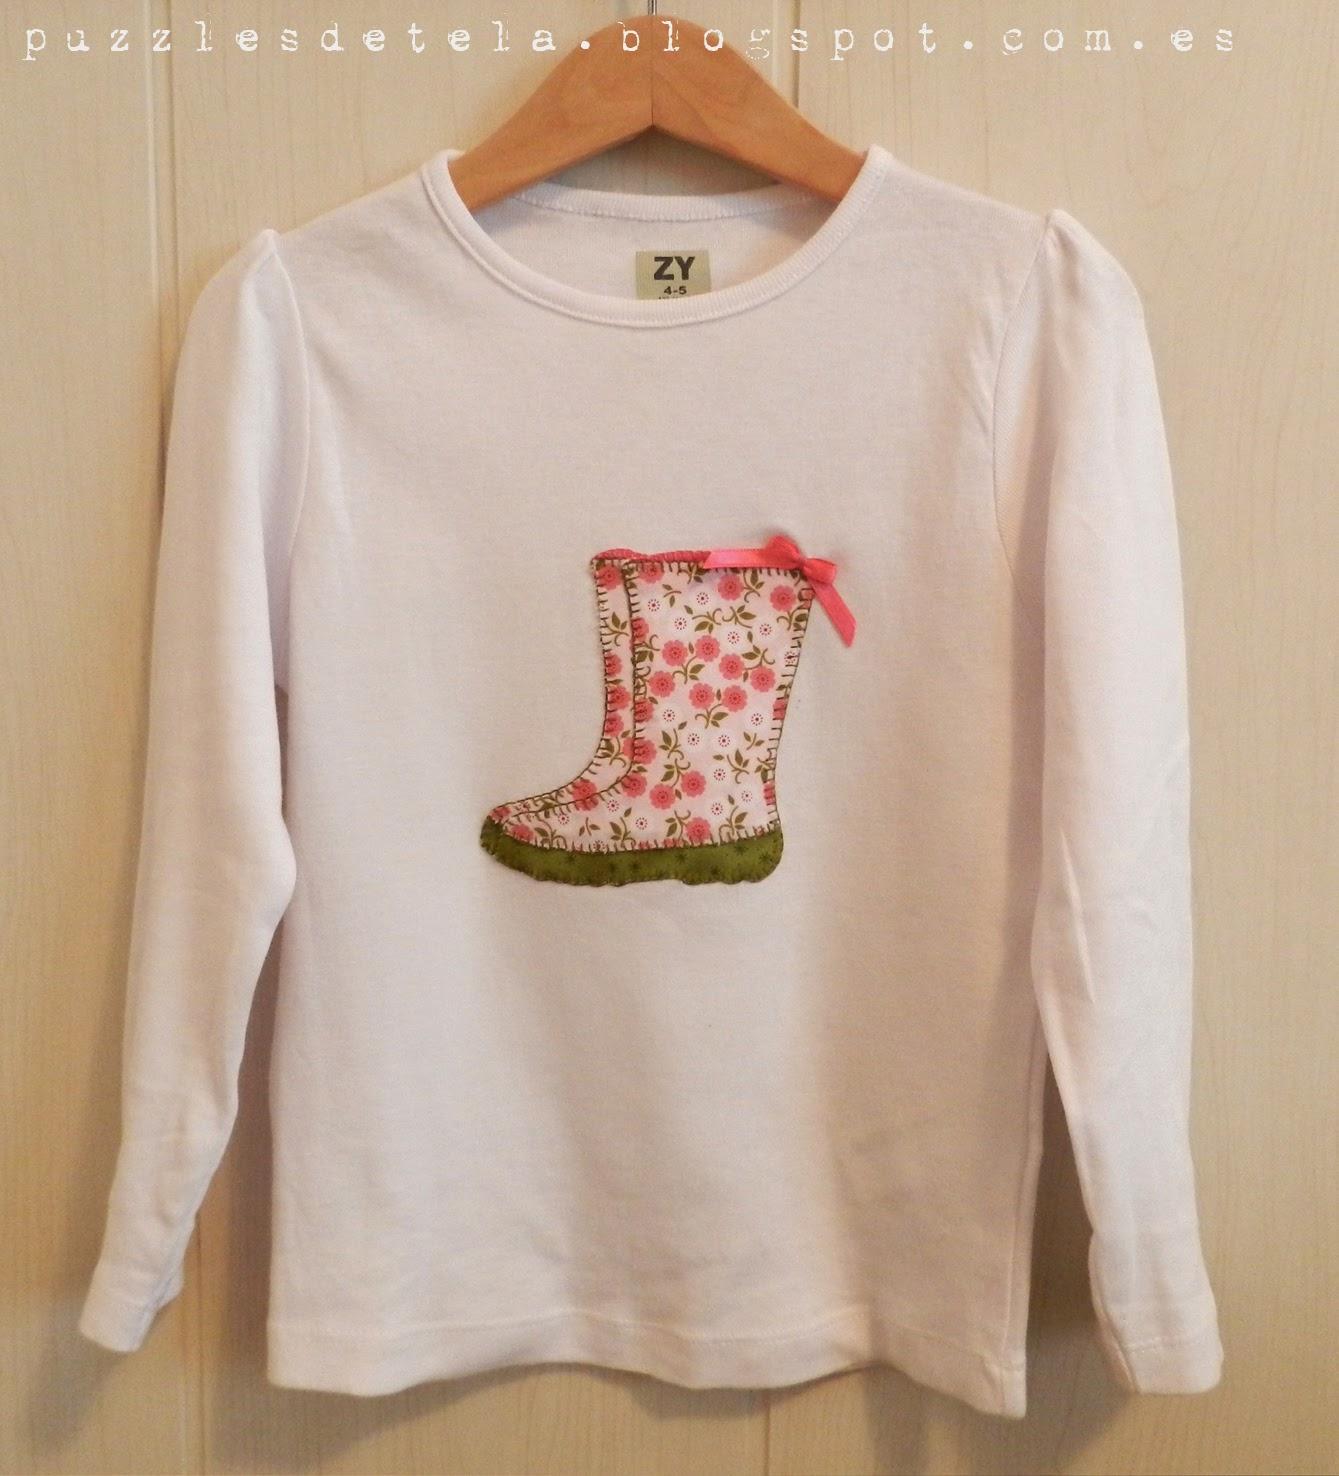 Camiseta niña, camiseta manga larga, camiseta patchwork, camiseta con aplicaciones, patchwork camisetas, aplicaciones, botas de agua, camiseta botas de agua